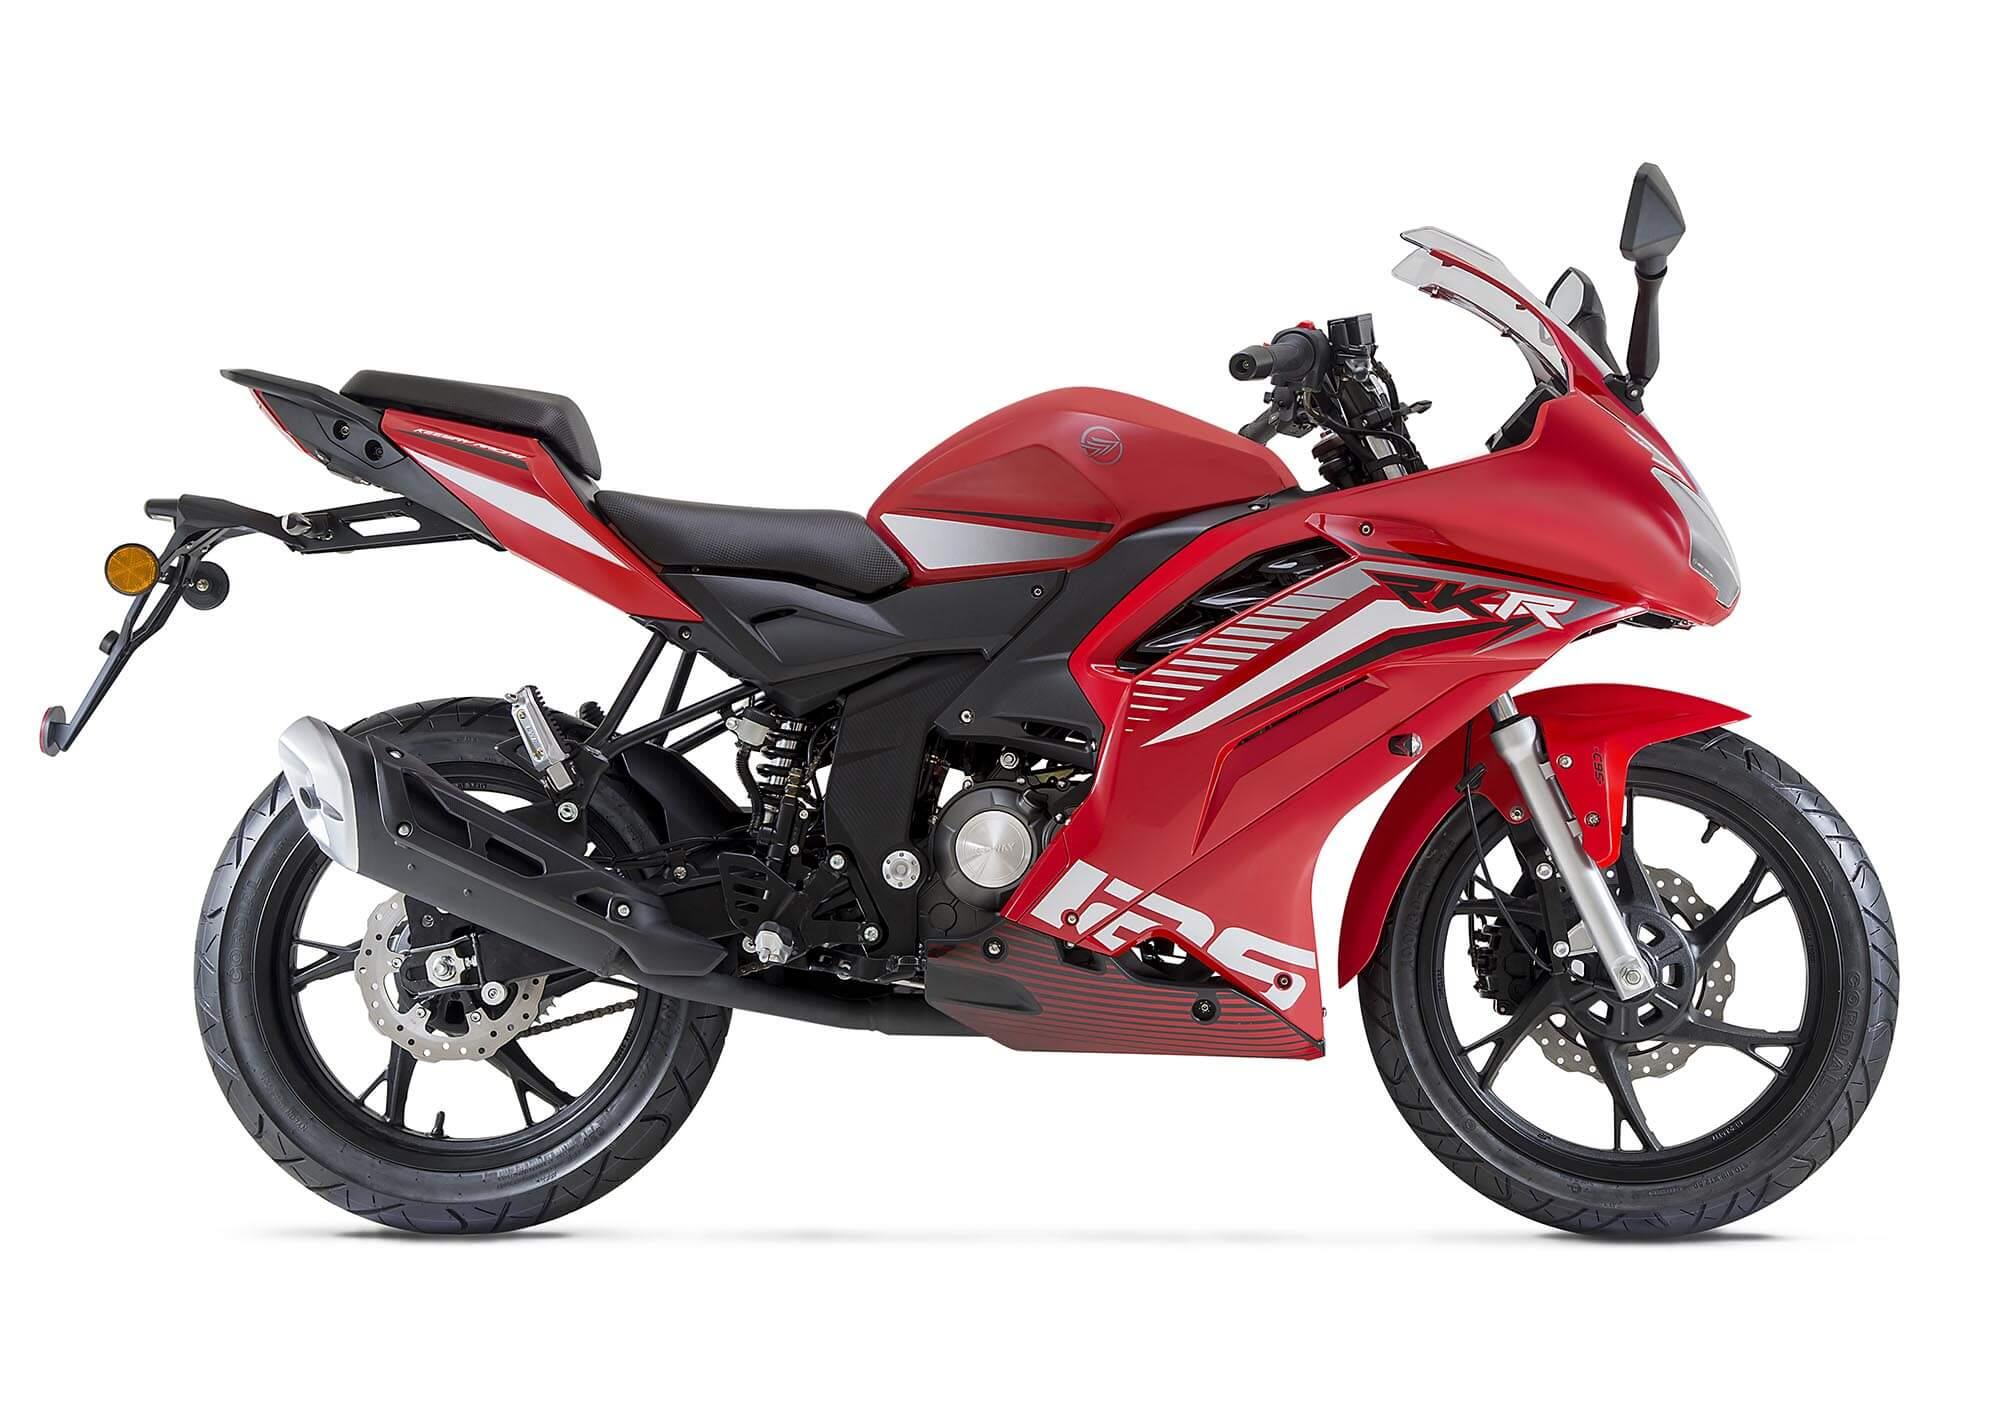 comprar-motos-keeway-rkr-125-rojo-motissimo-barcelona